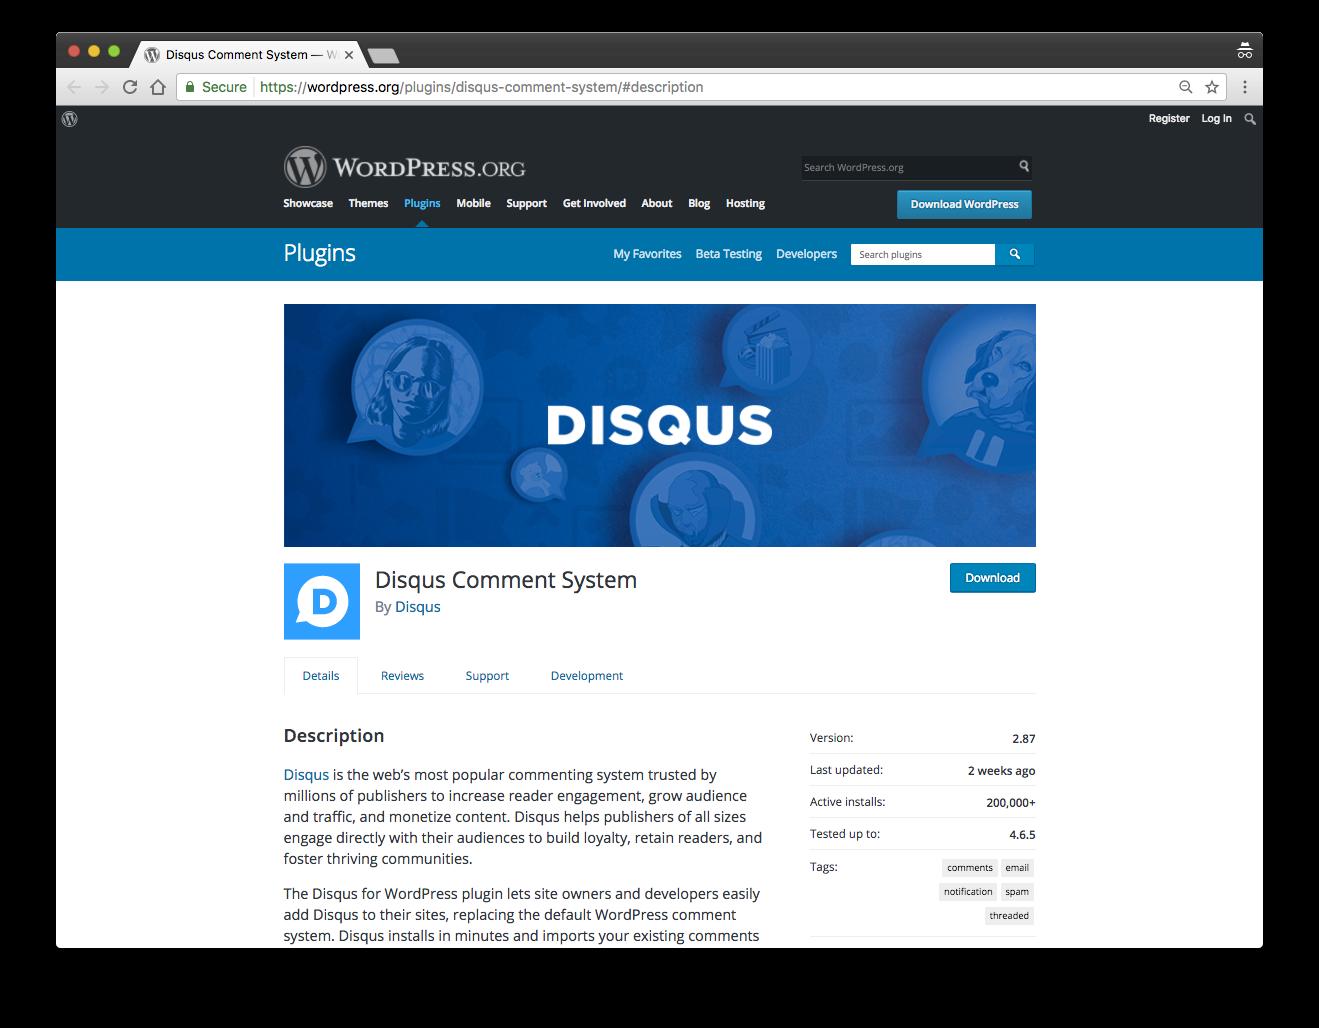 disqus-wordpress-plugin-page-2.png